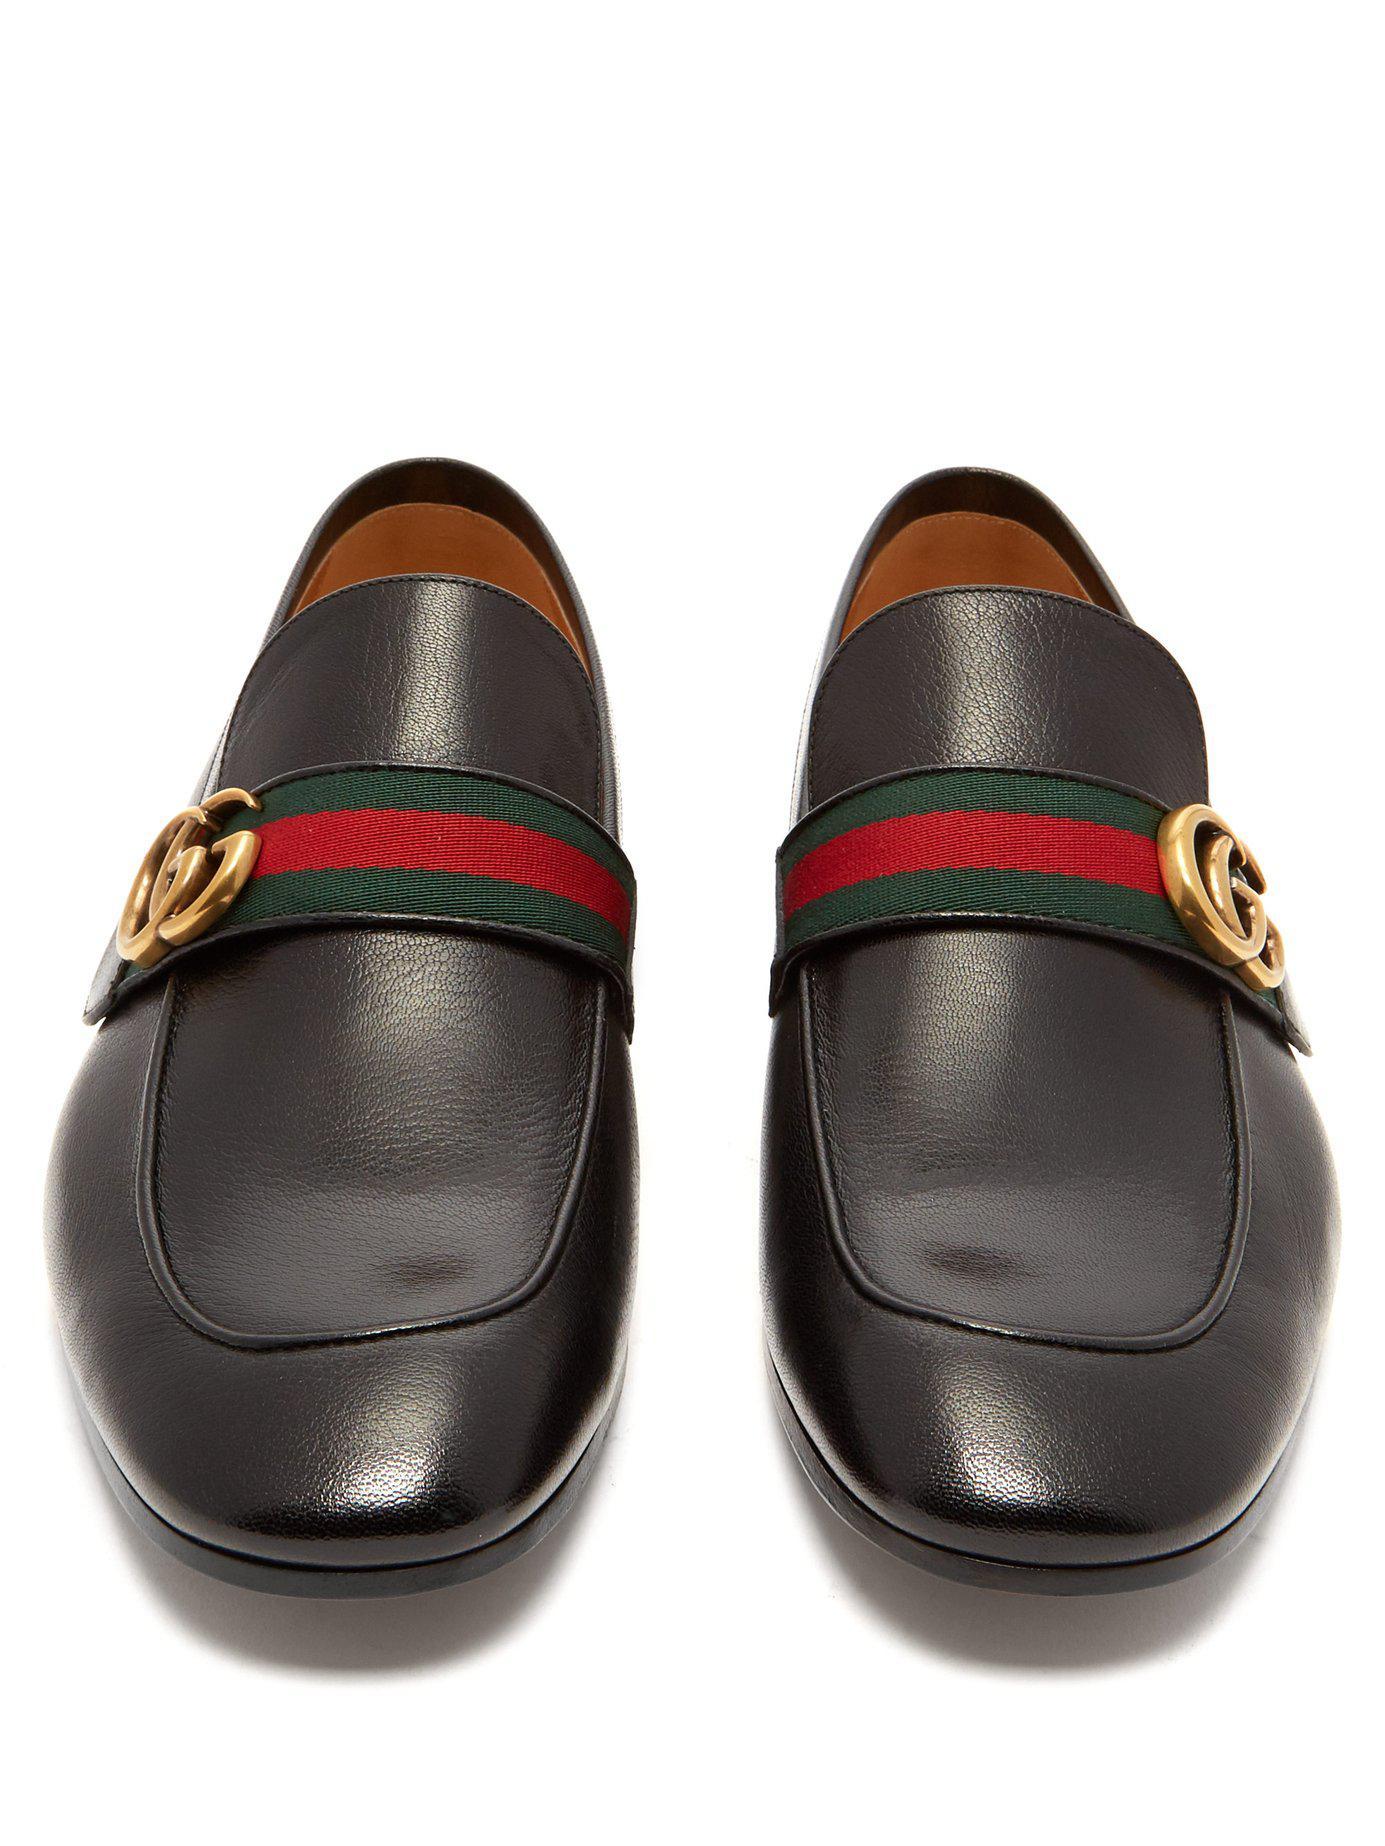 2bb27e80617 Gucci - Black Donnie Gg Web Stripe Leather Loafers for Men - Lyst. View  fullscreen